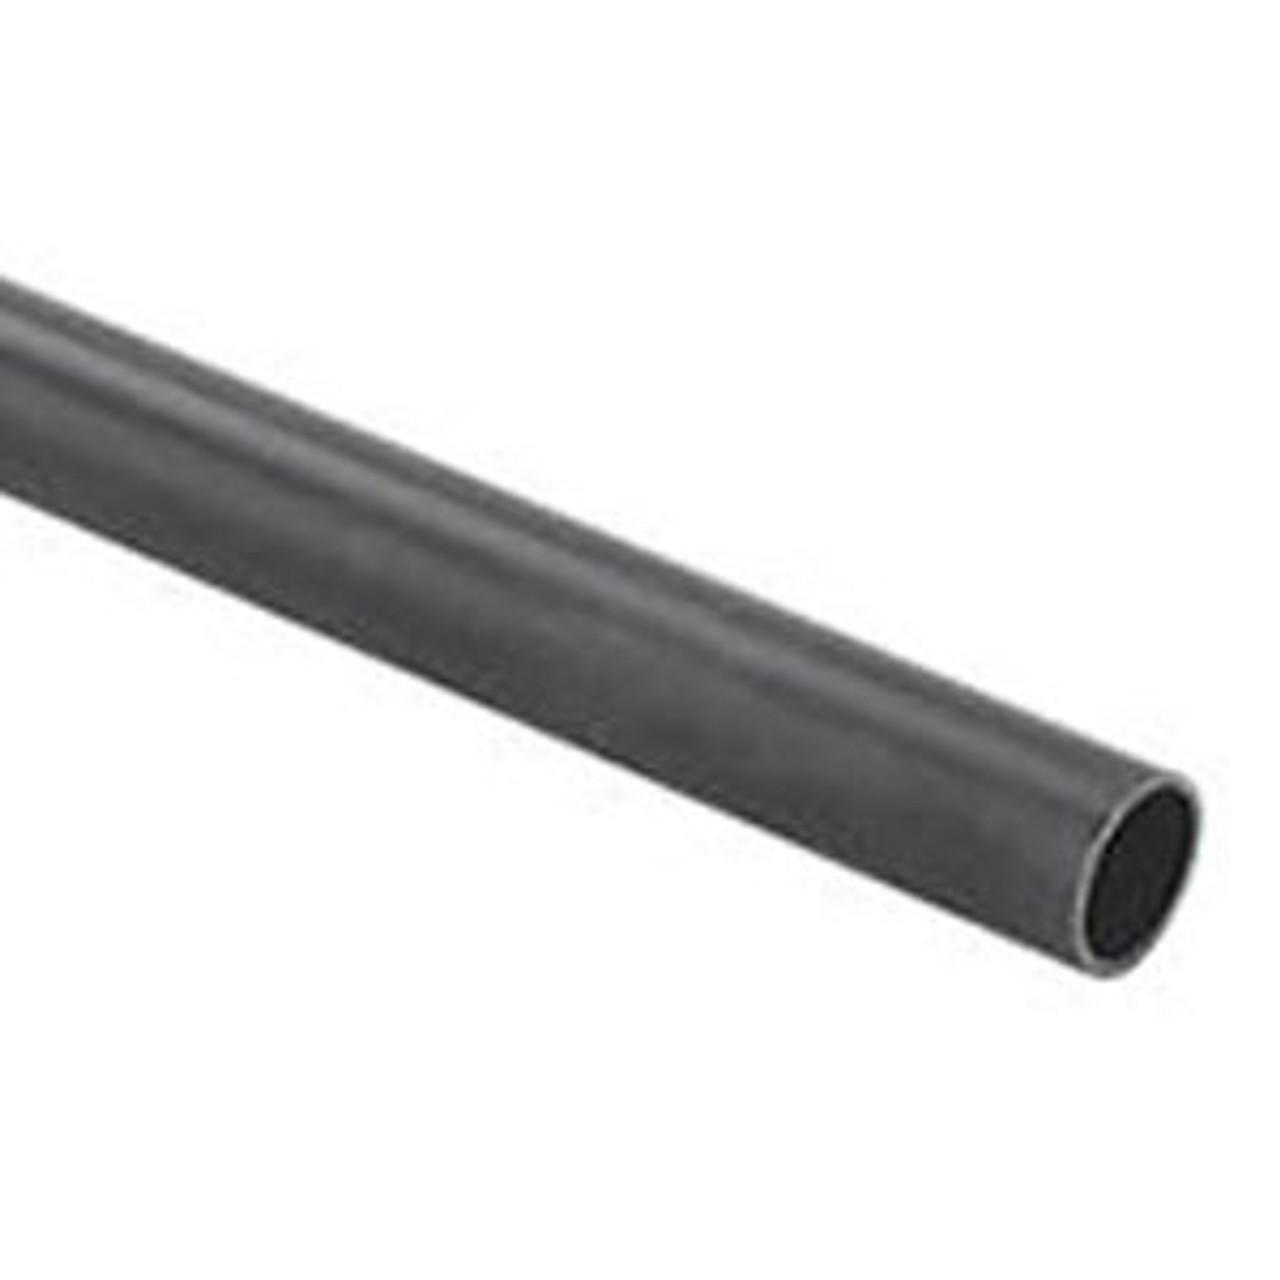 32/37mm class 2 power ducting.